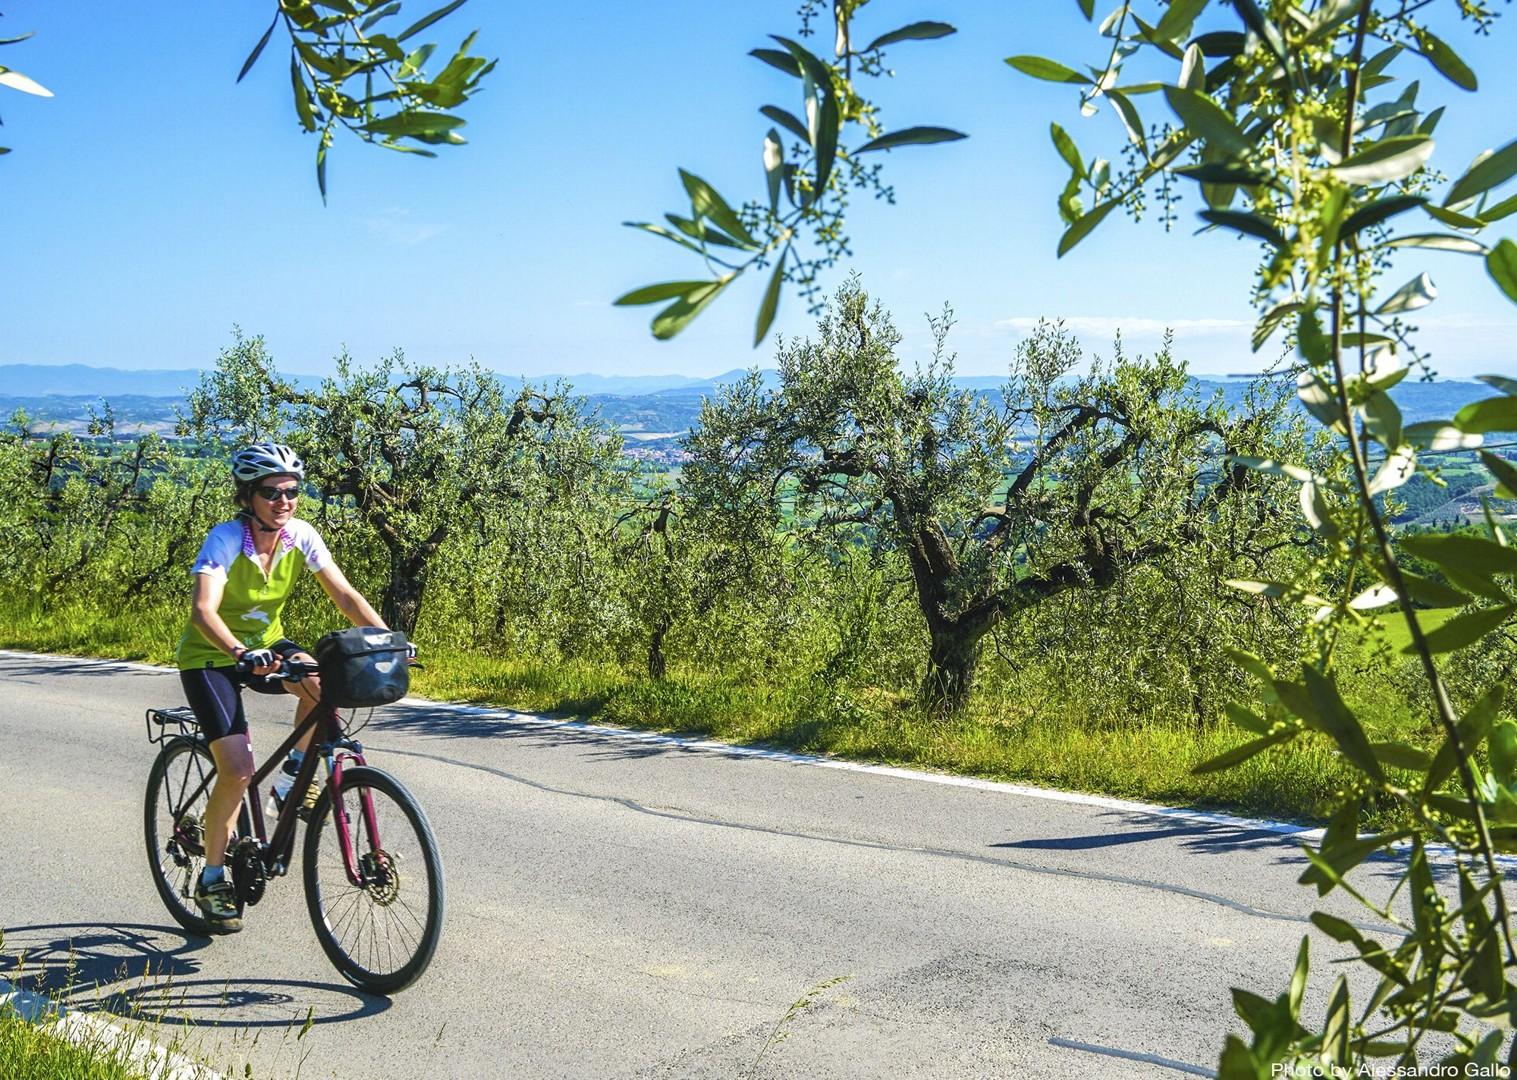 pisa-to-florence-leisure-holiday-saddle-skedaddle-italy.jpg - Italy - Tuscany - Pisa to Florence - Self-Guided Leisure Cycling Holiday - Leisure Cycling